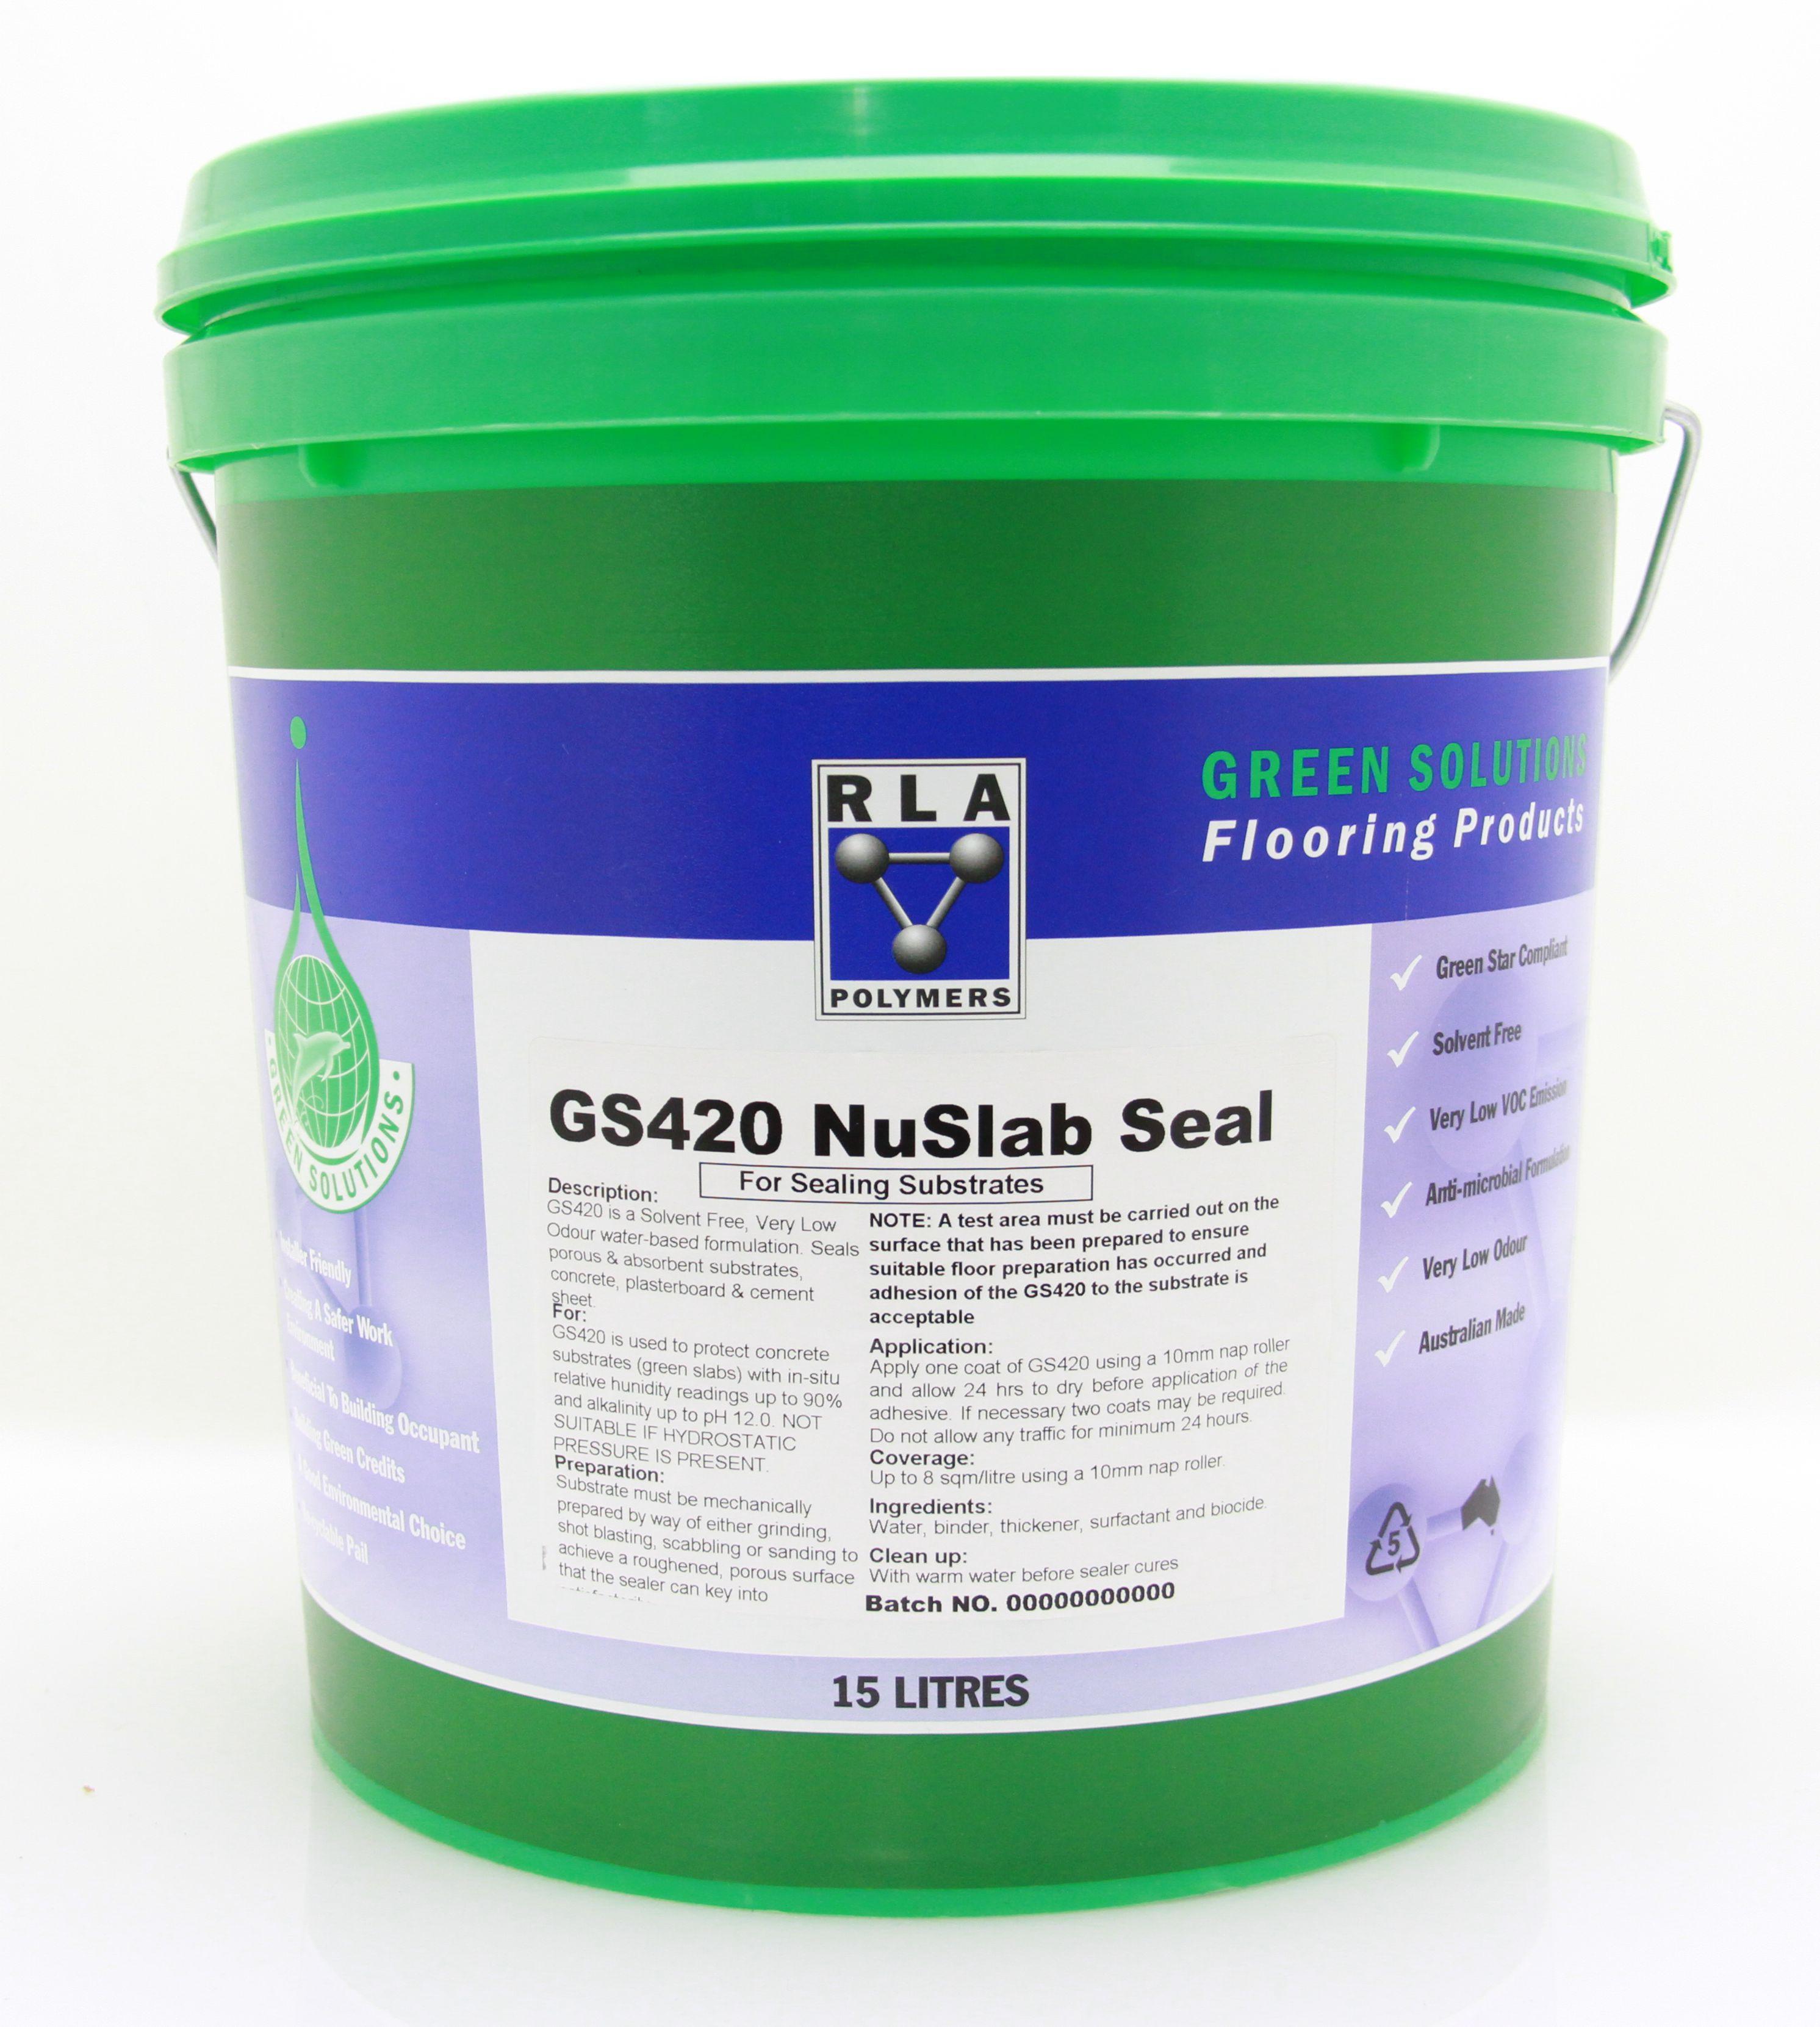 GS420 NuSlab Seal